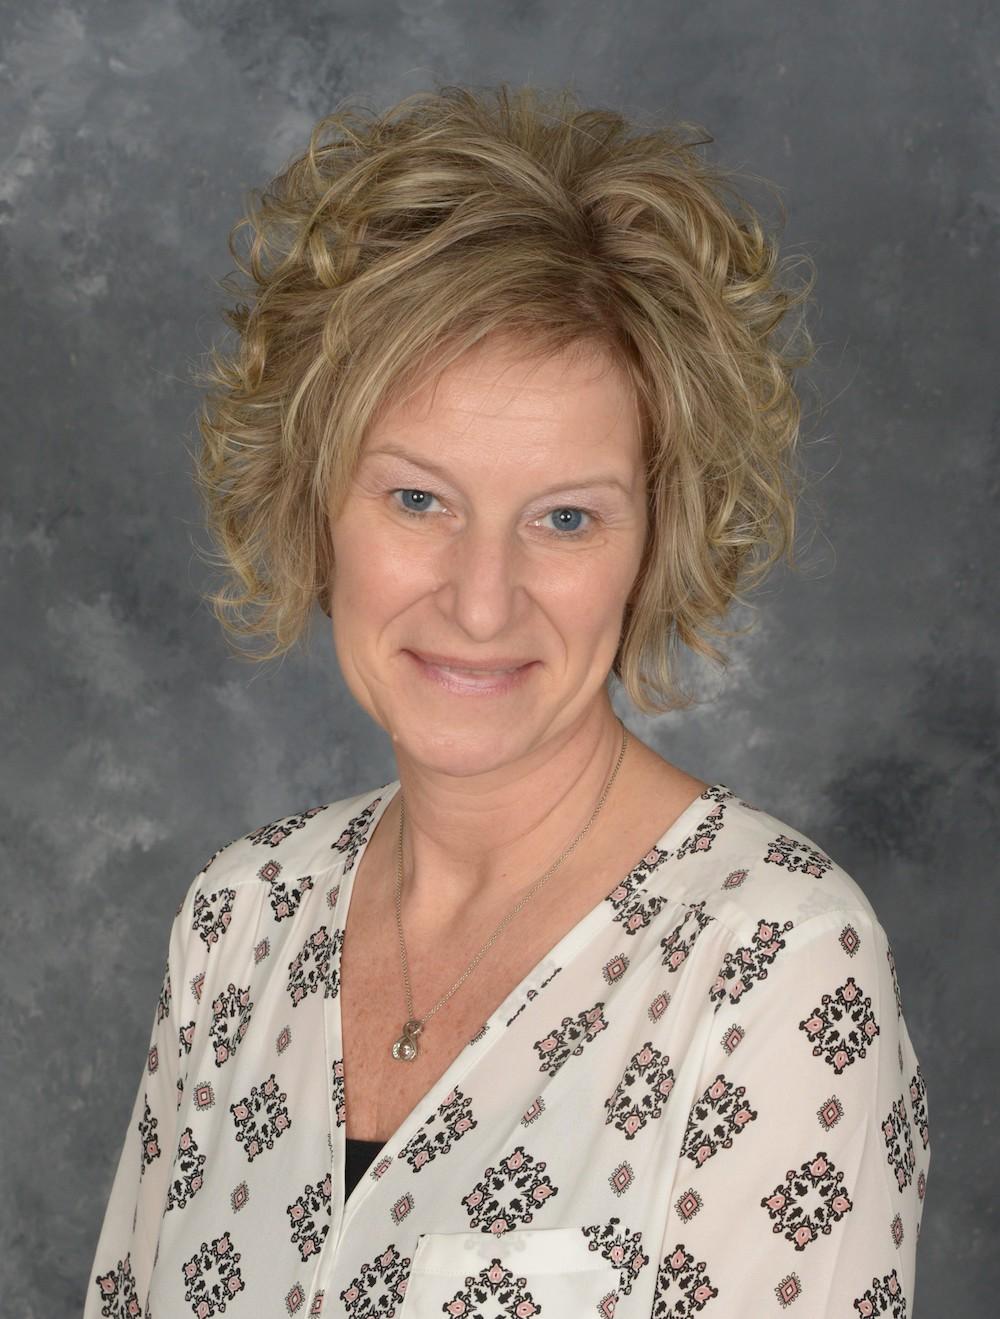 Kelly Broder